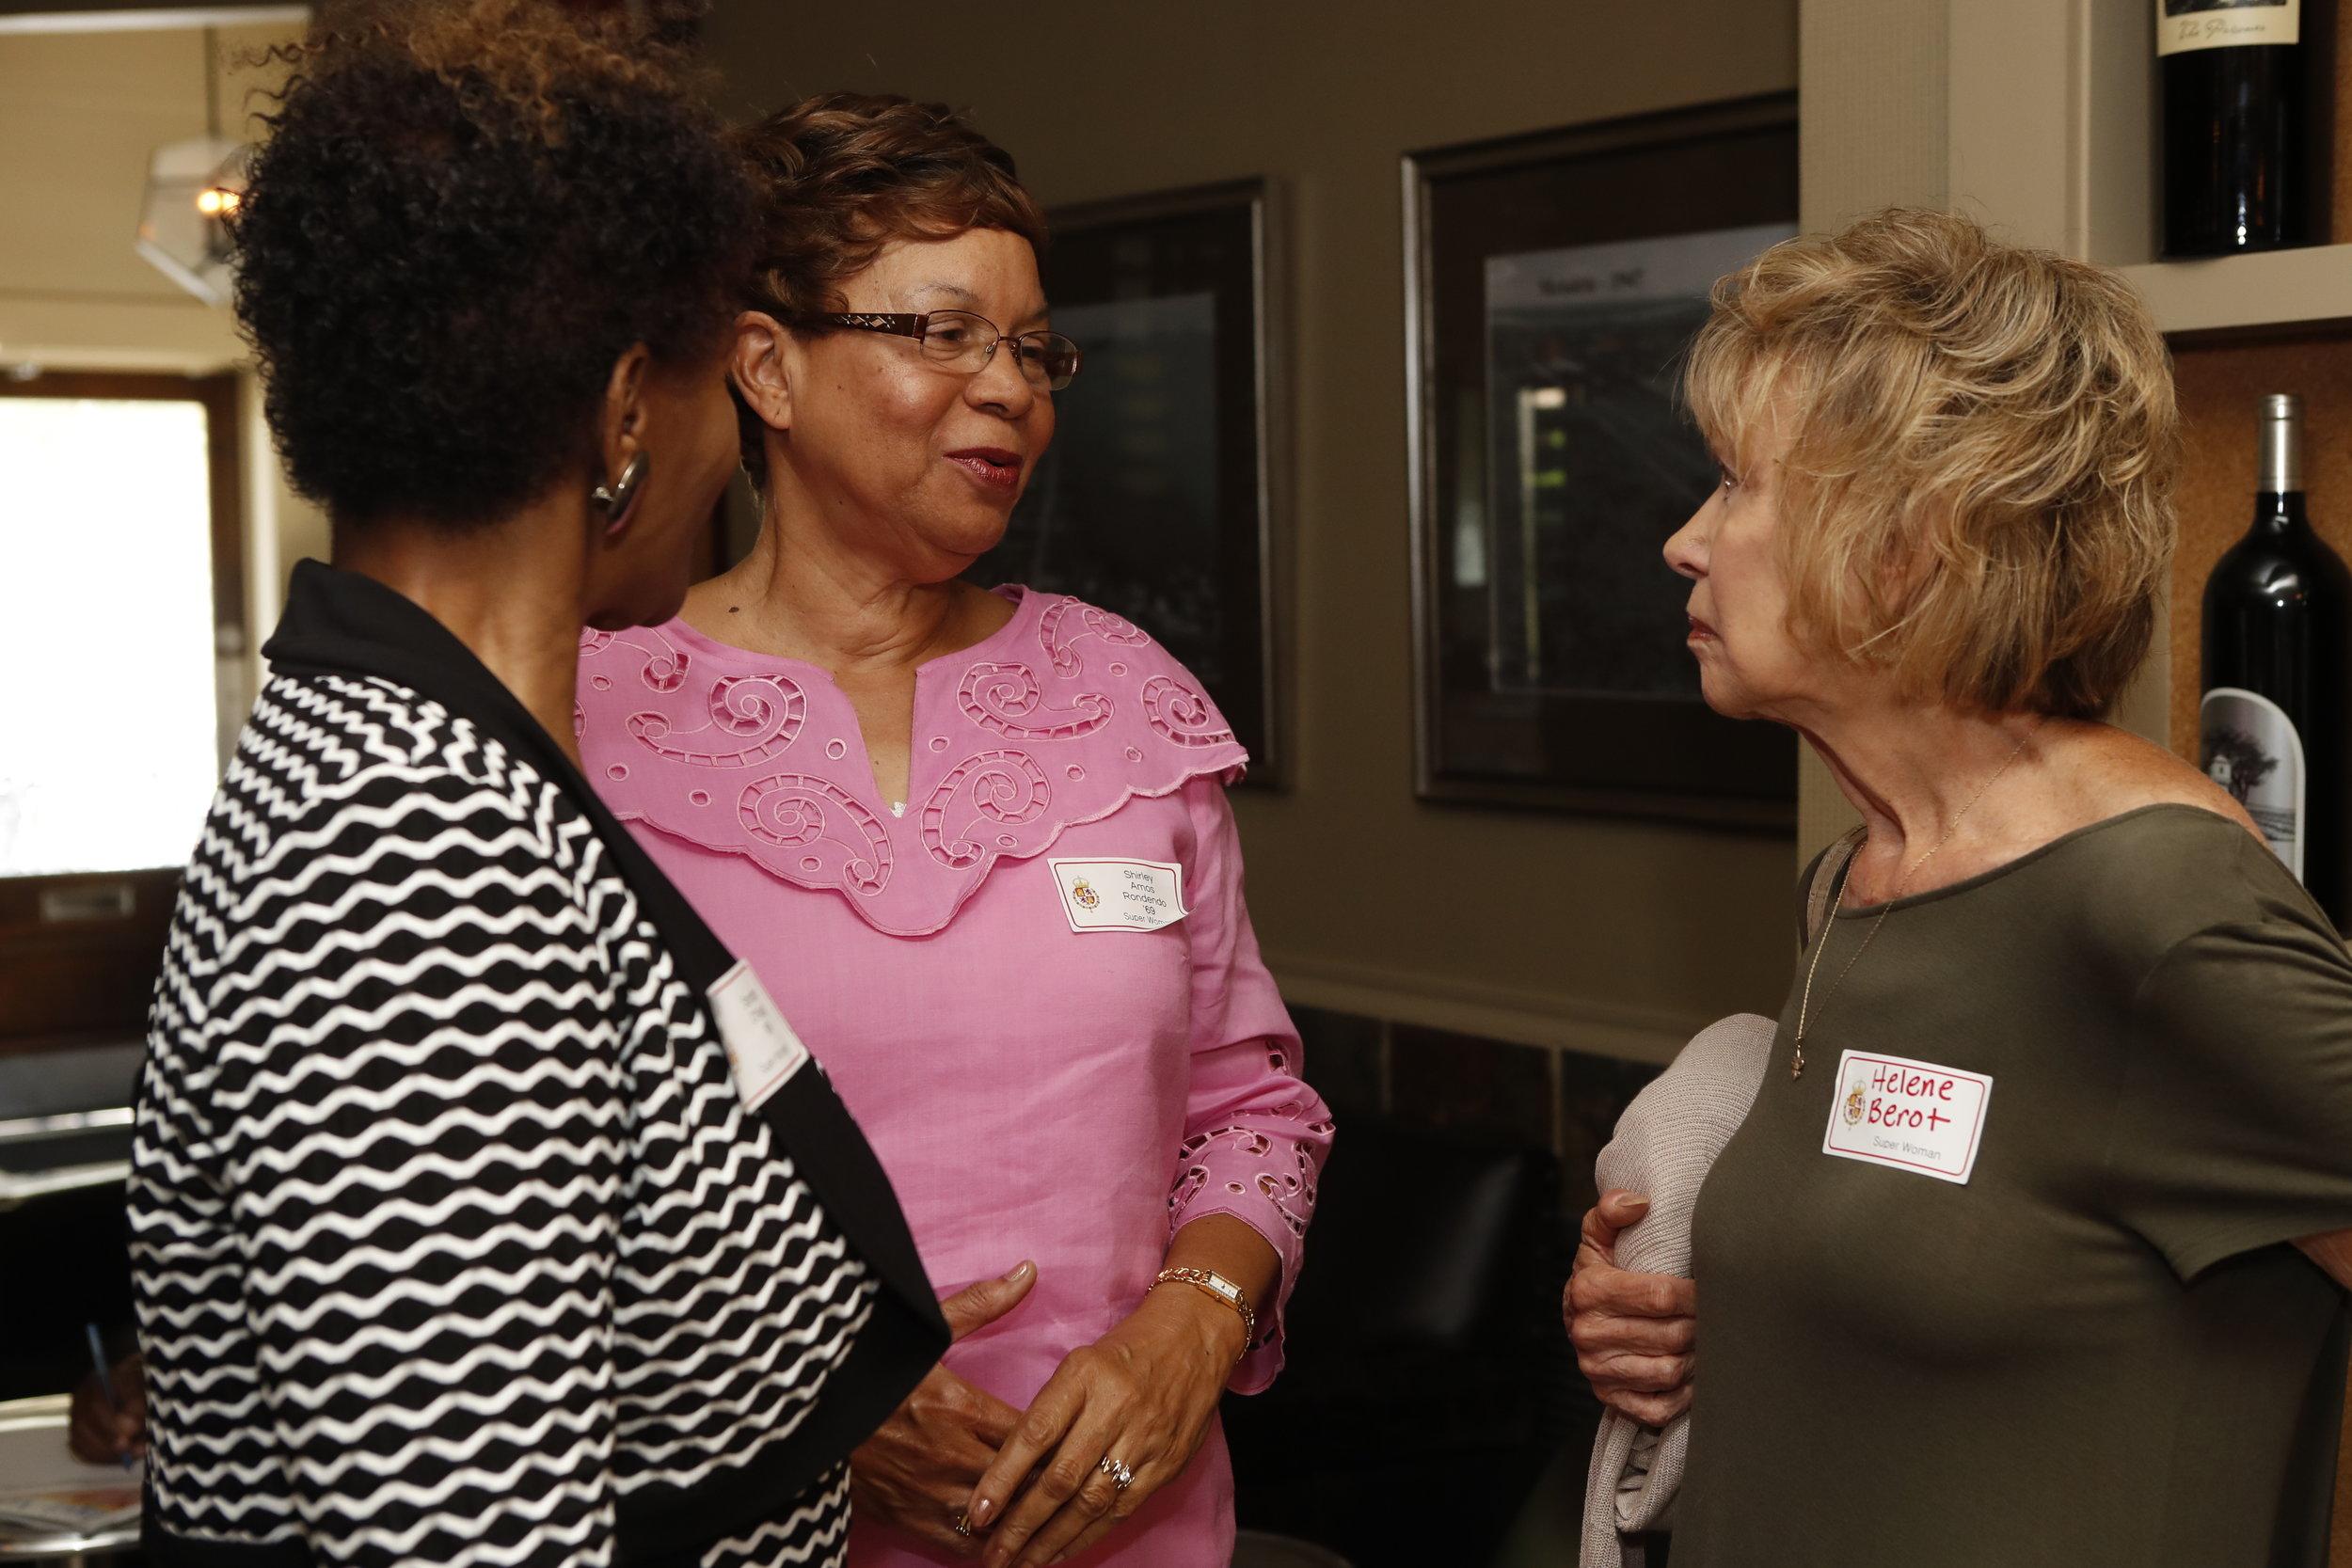 Sandra O'Neal, Shirley Rondendo and Helene Berot